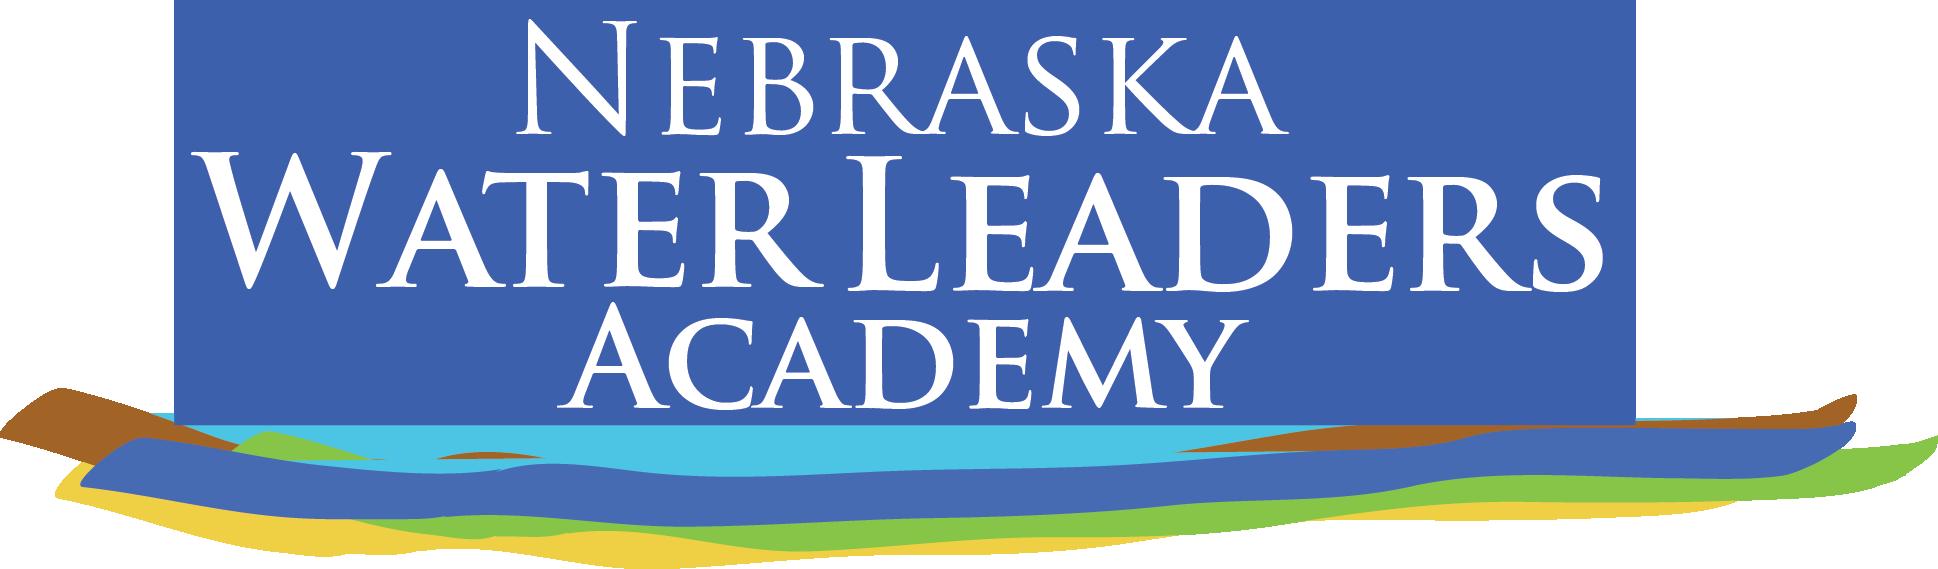 Nebraska Water Leaders Academy